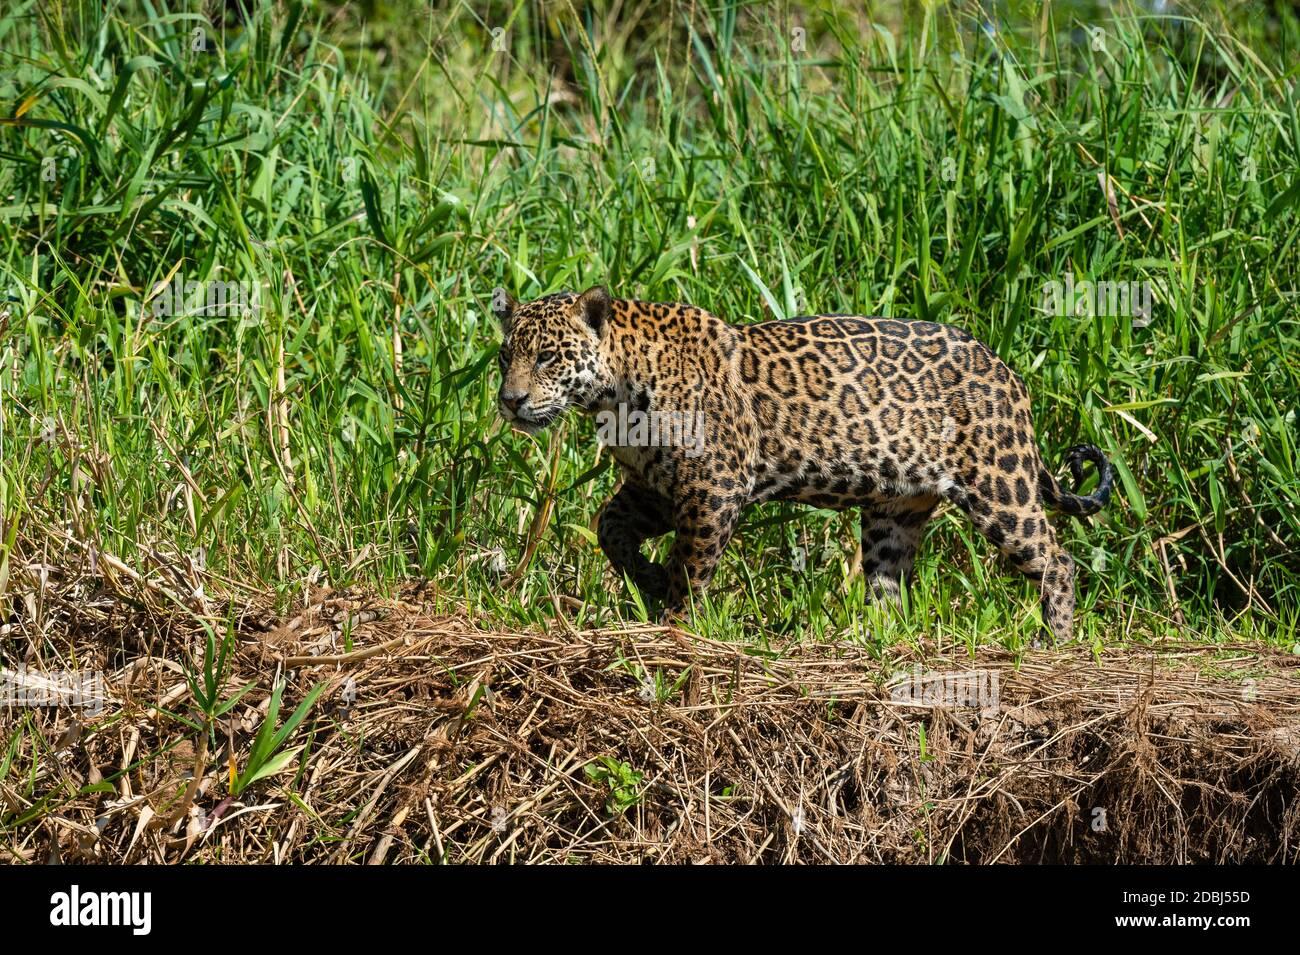 Jaguar (Panthera onca), Pantanal, Mato Grosso, Brazil, South America Stock Photo